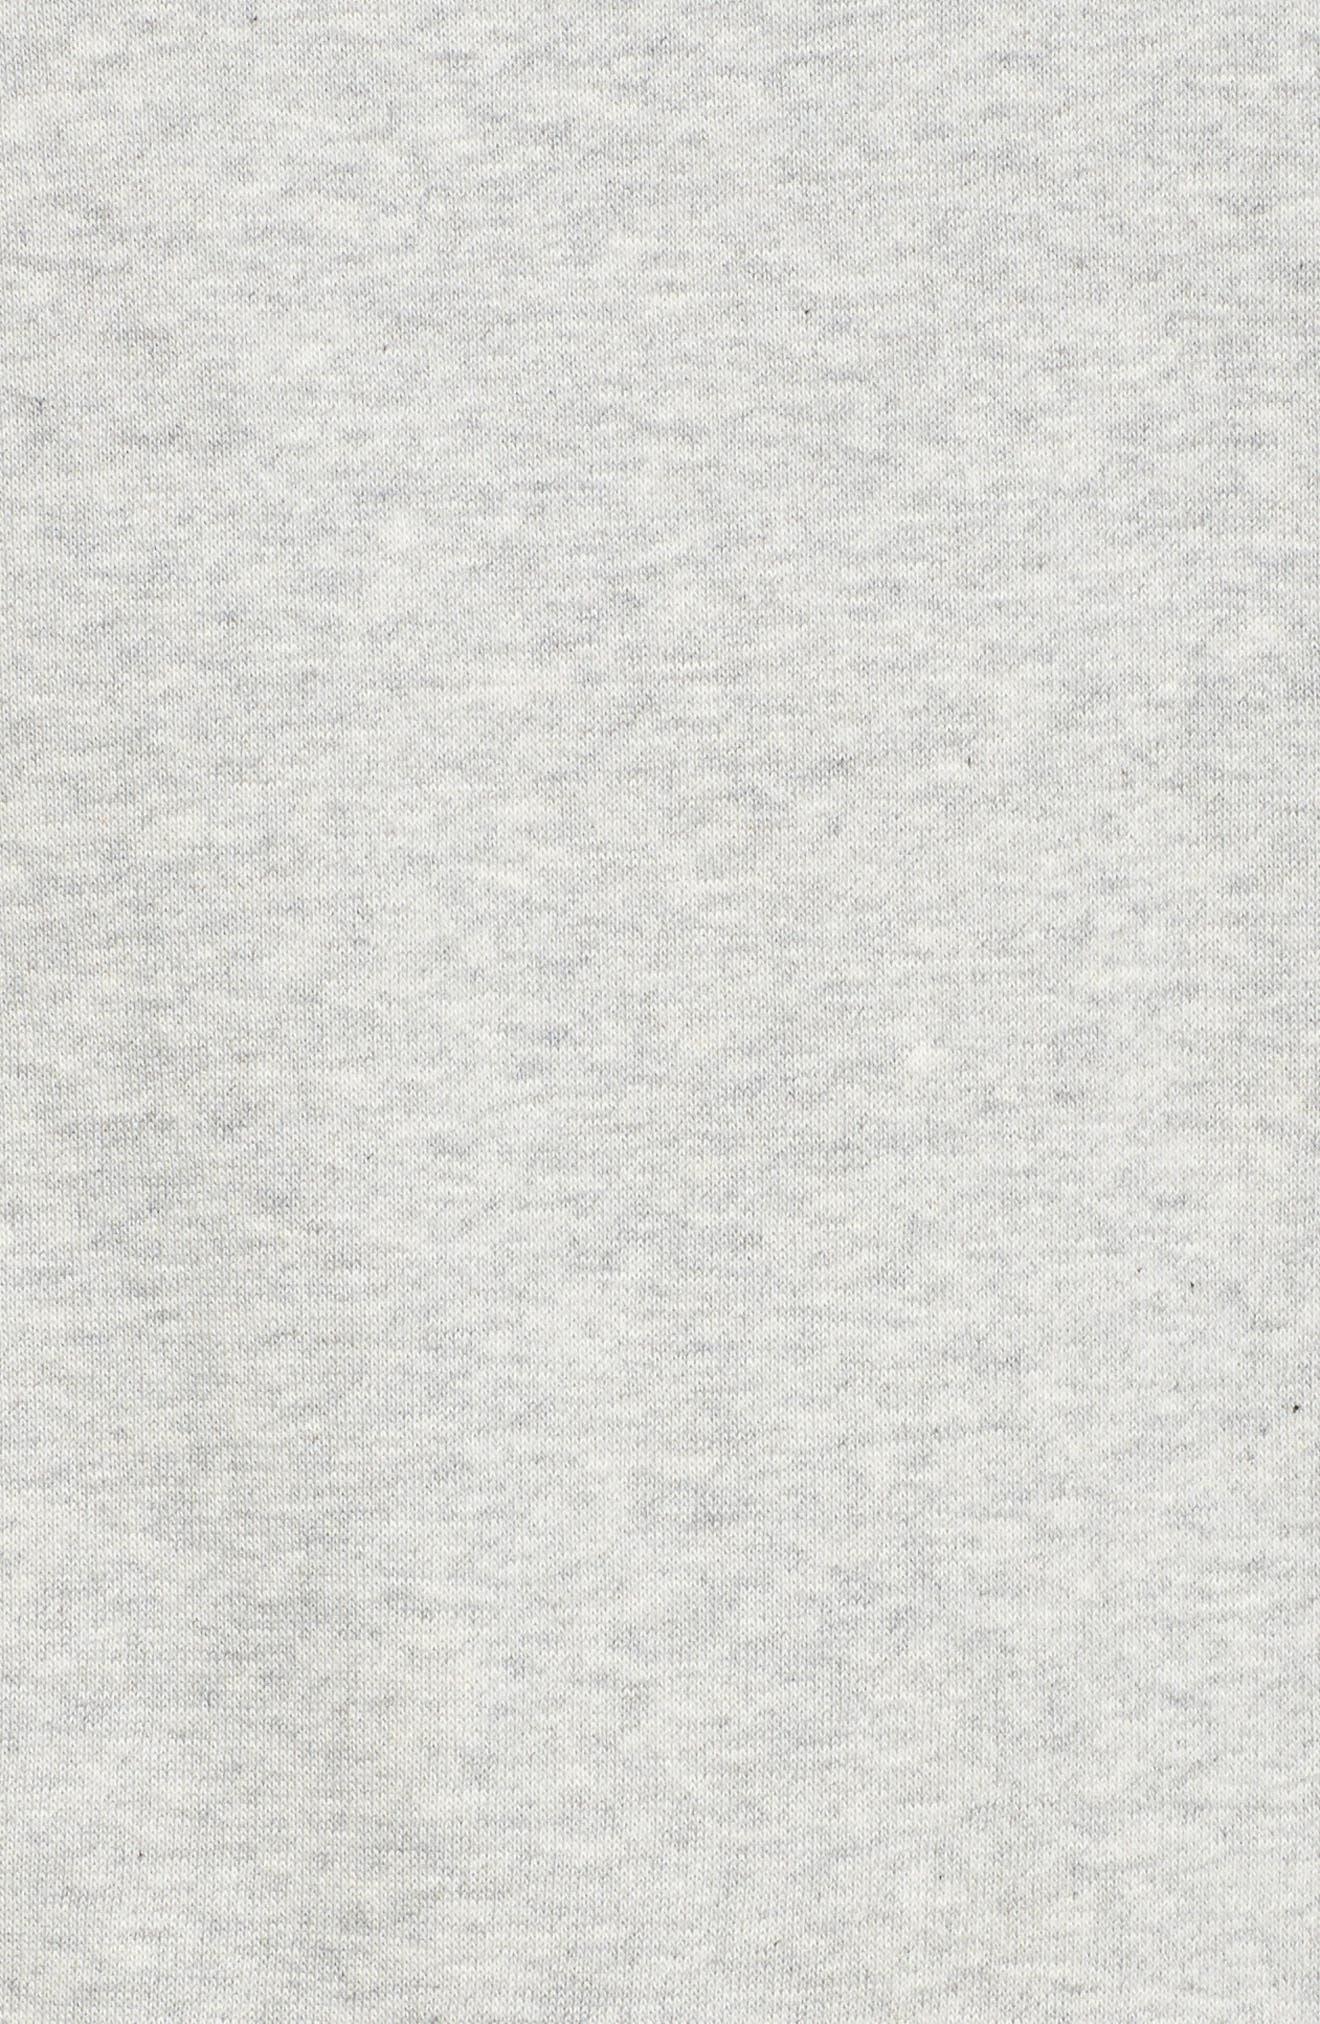 Rafaella Sweatshirt,                             Alternate thumbnail 6, color,                             Light Grey / Peacoat/ Red